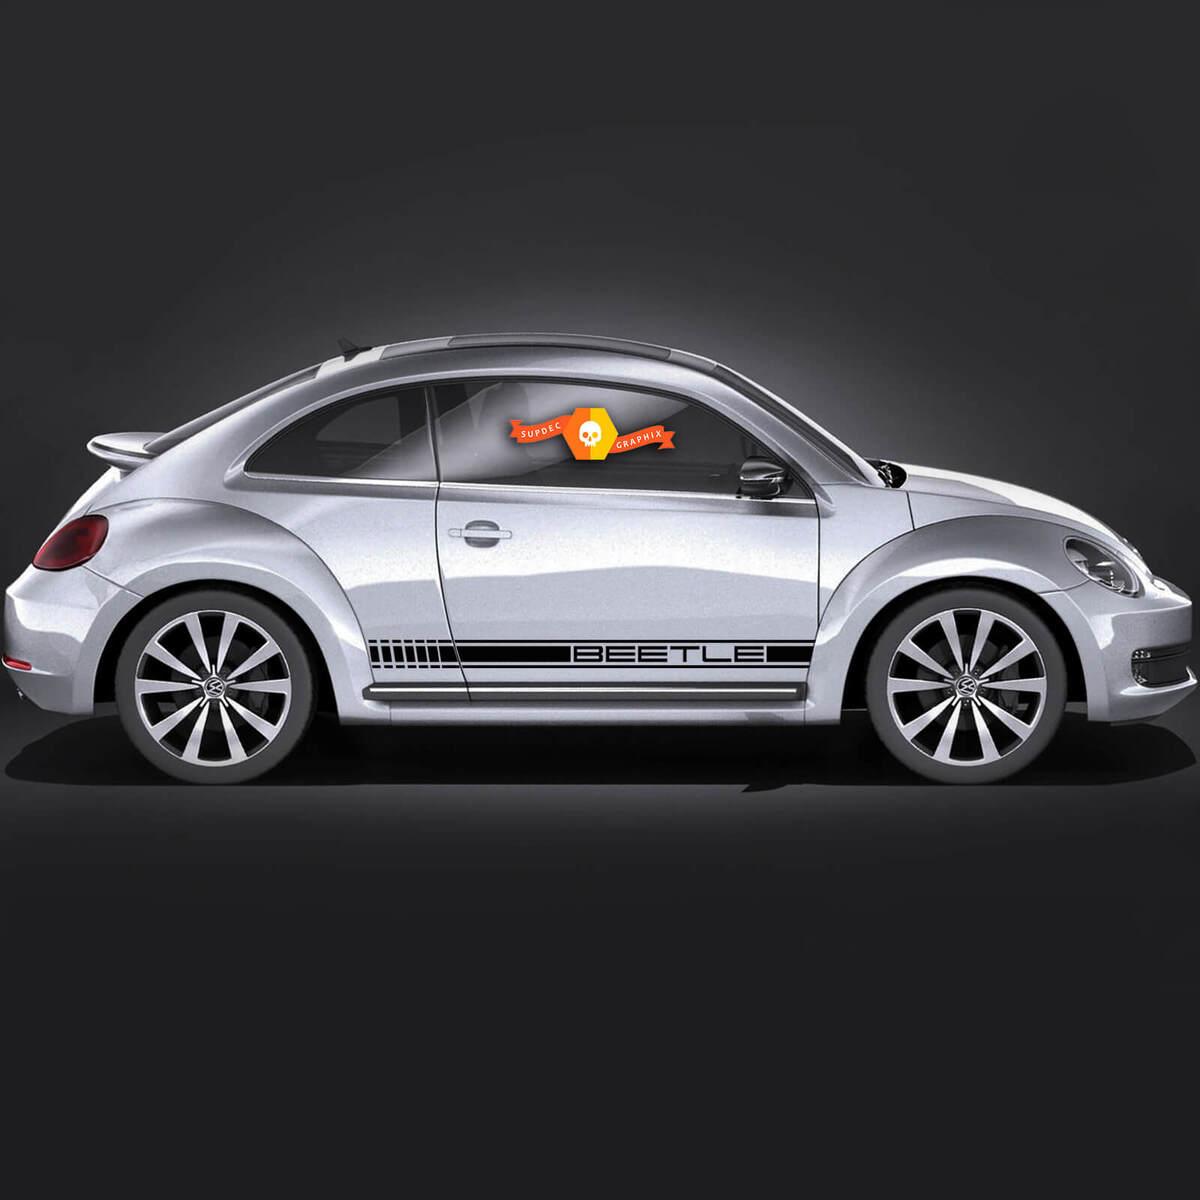 Volkswagen Beetle rocker Stripe Porsche Look Graphics Decals Cabrio style fit any year